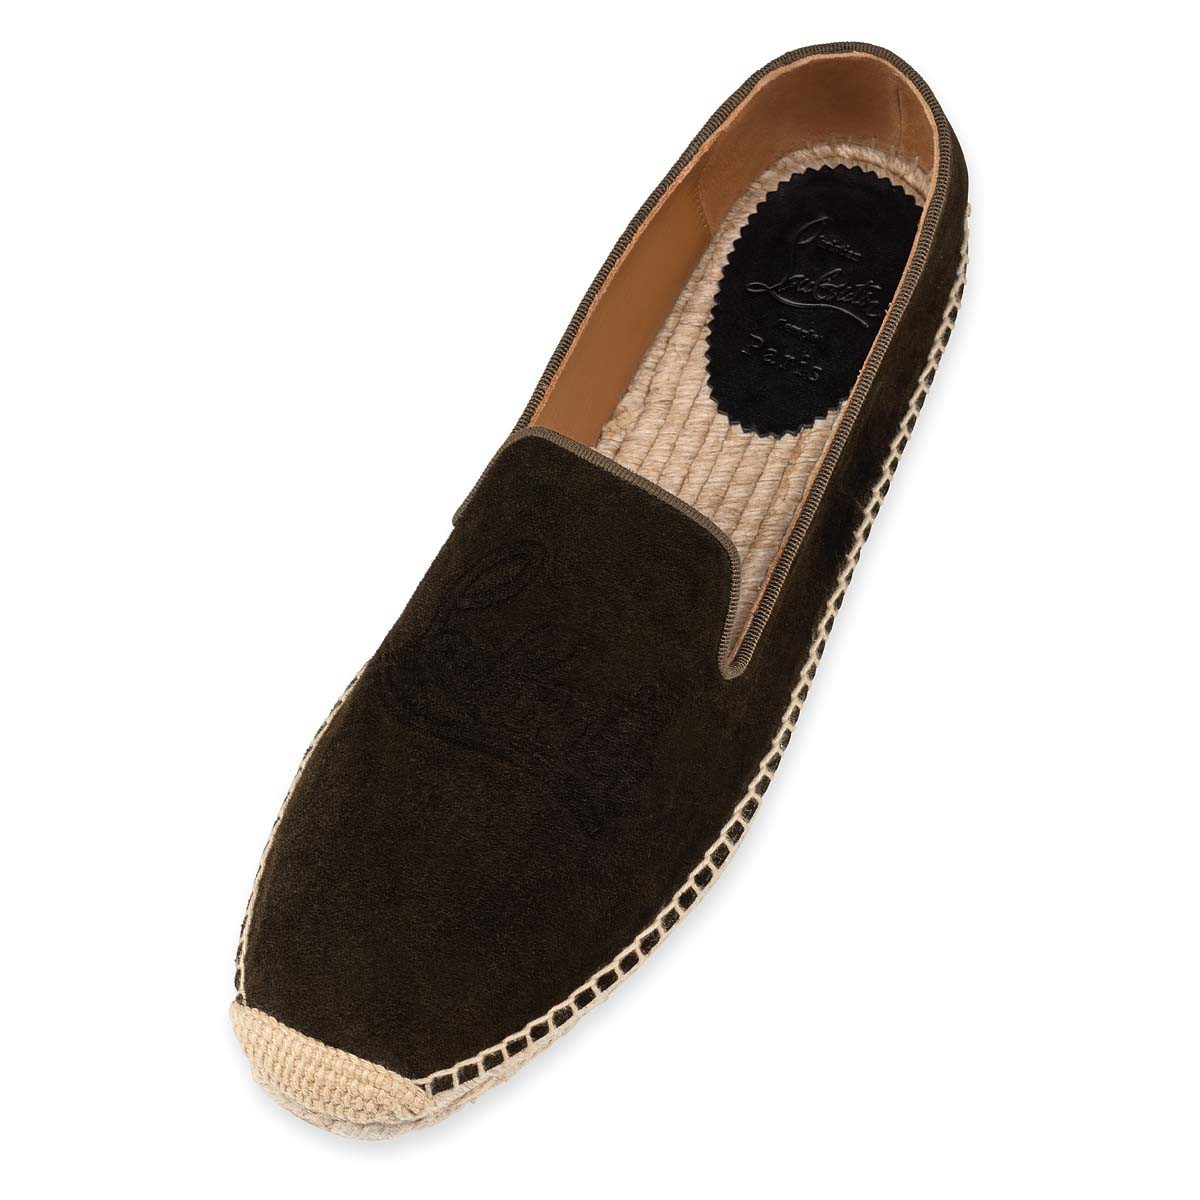 Shoes - Esparadra Flat - Christian Louboutin